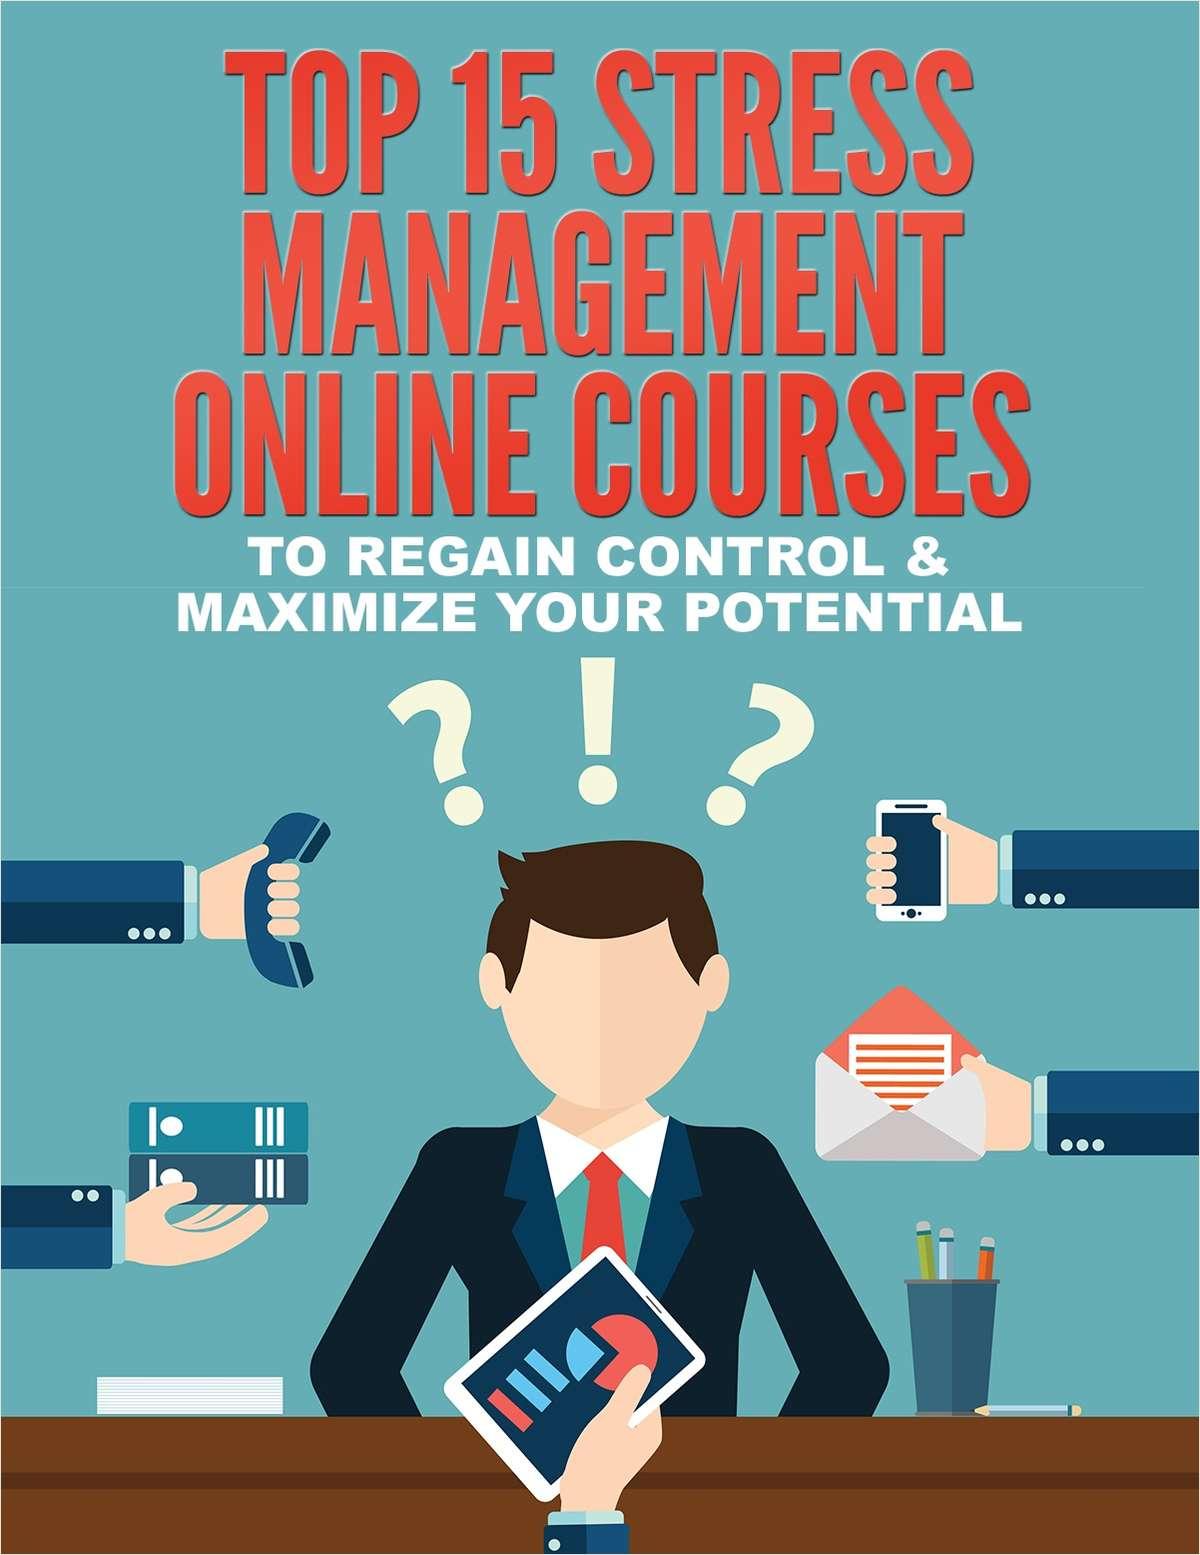 Top 15 Stress Management Online Courses to Regain Control & Maximize Your Potential